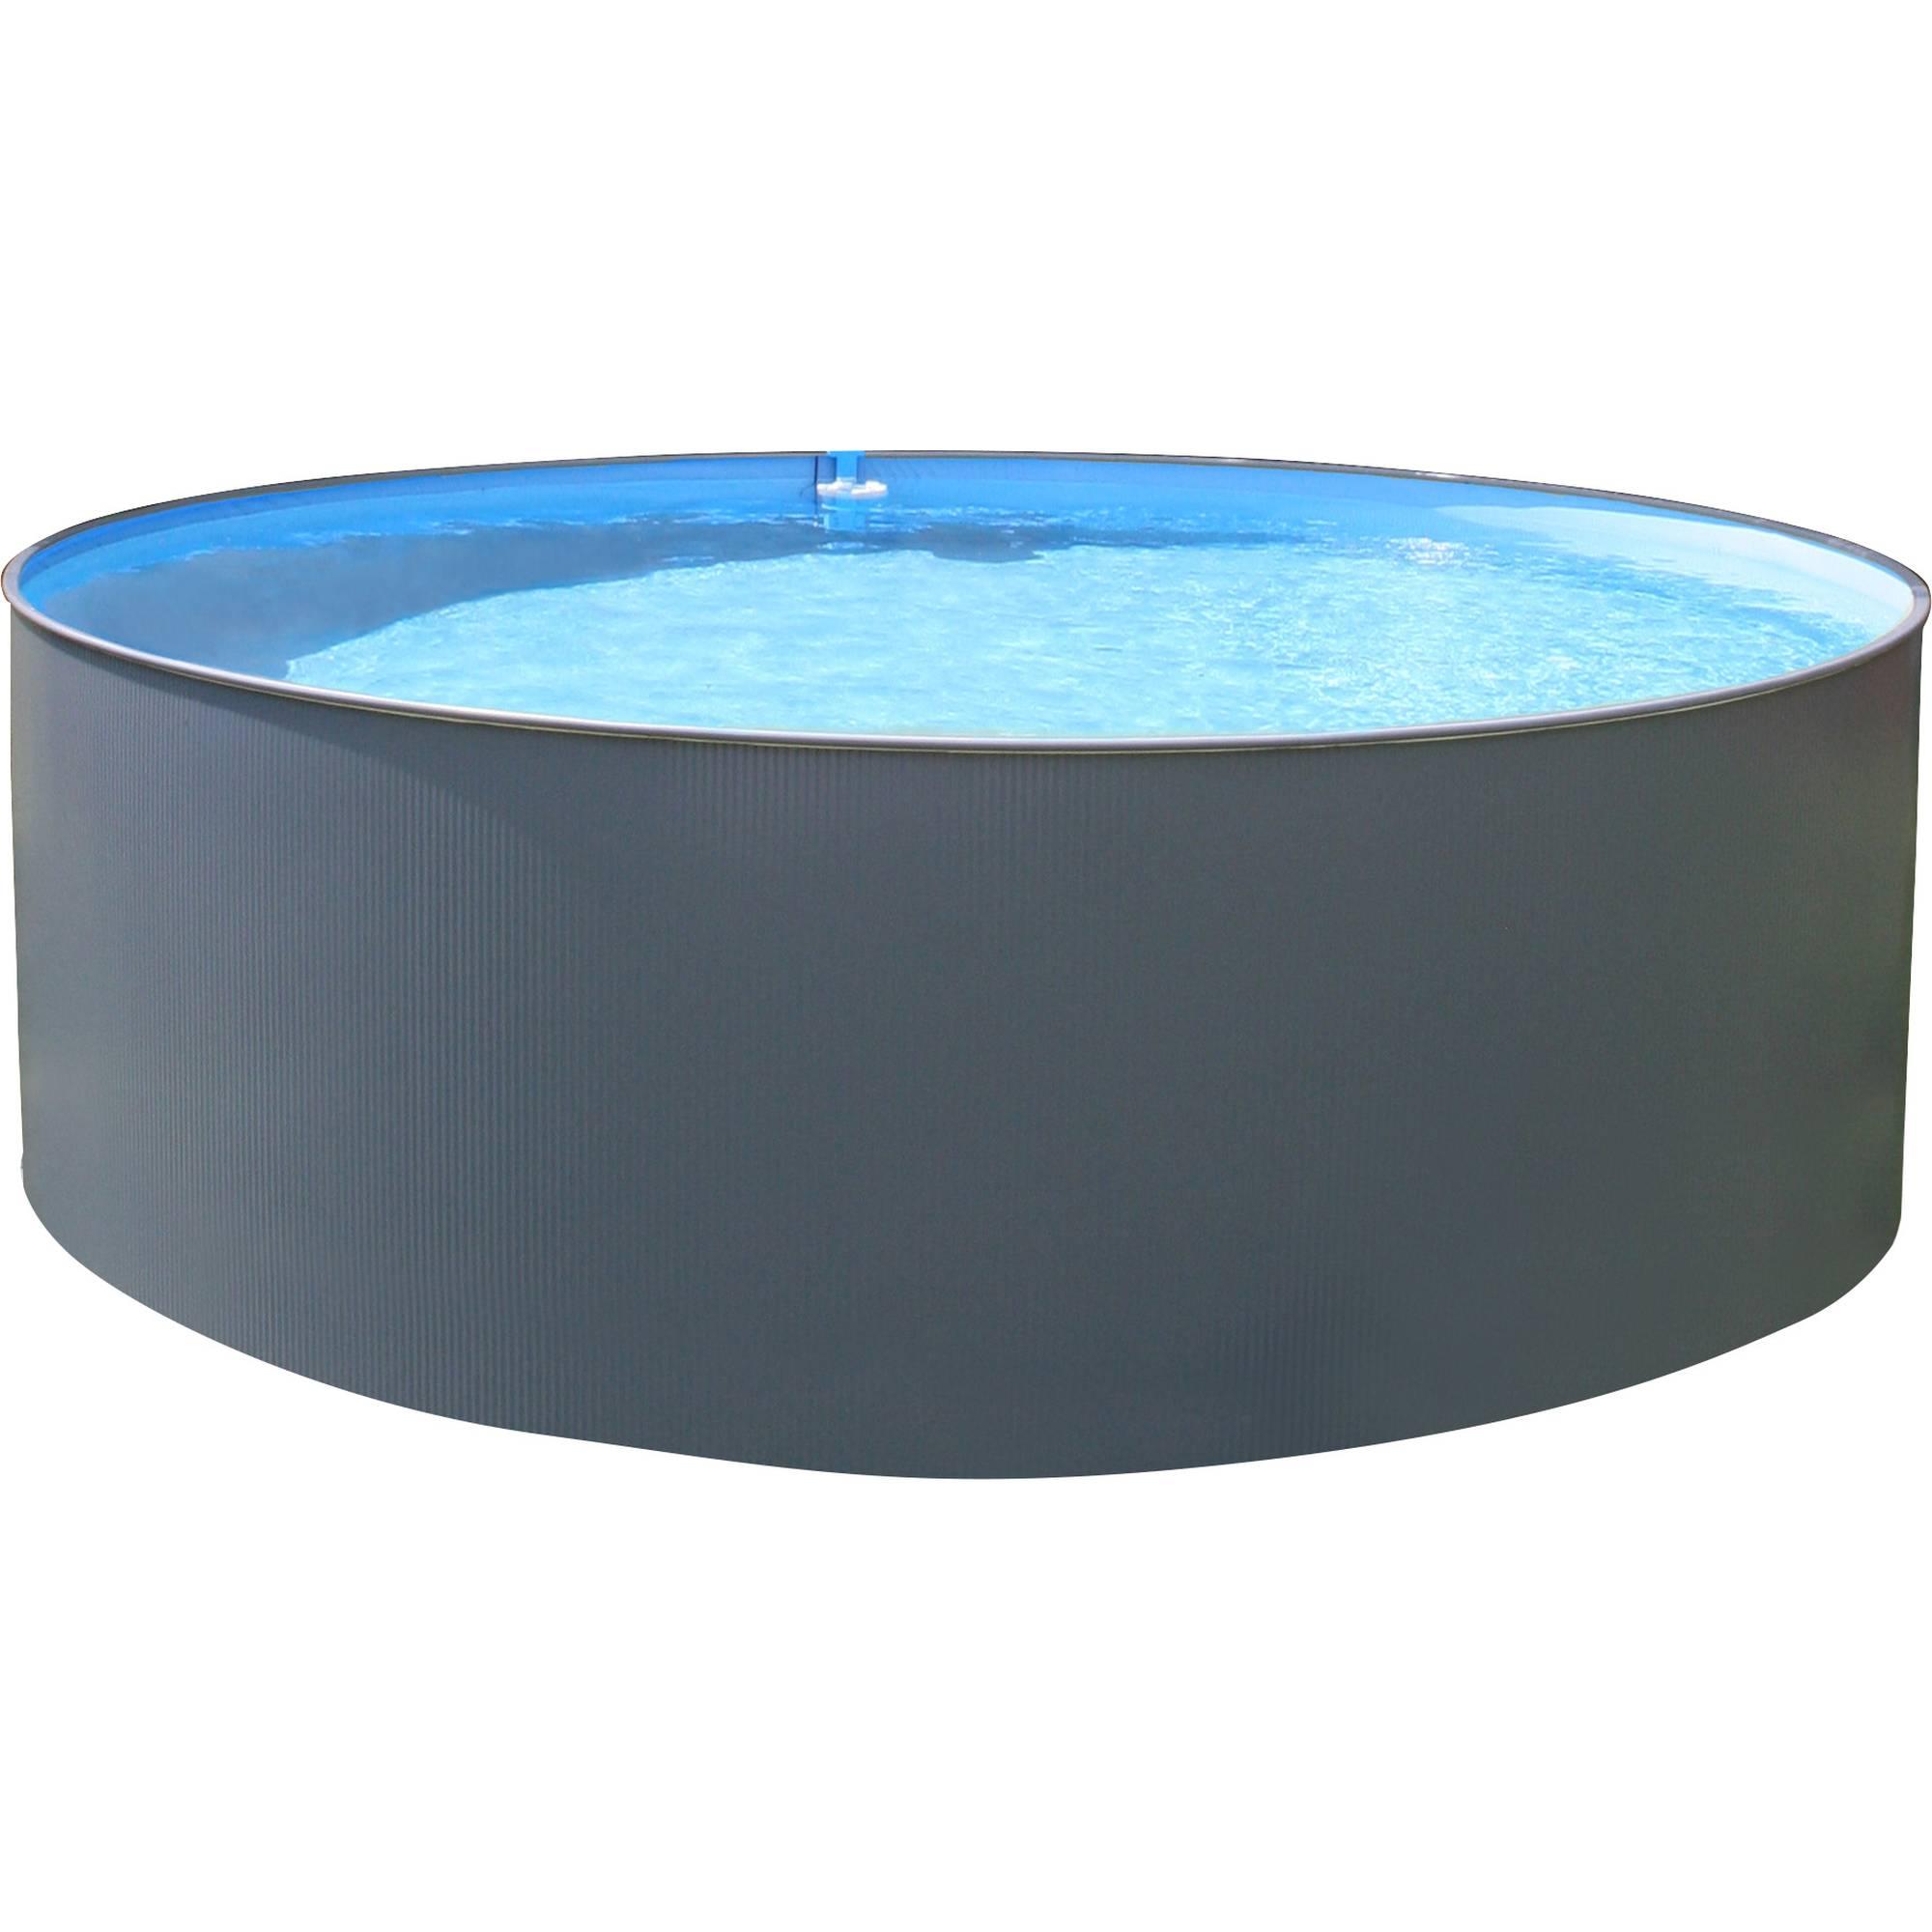 Stahlwandpool rundform anthrazit 450x90 cm,  overlap